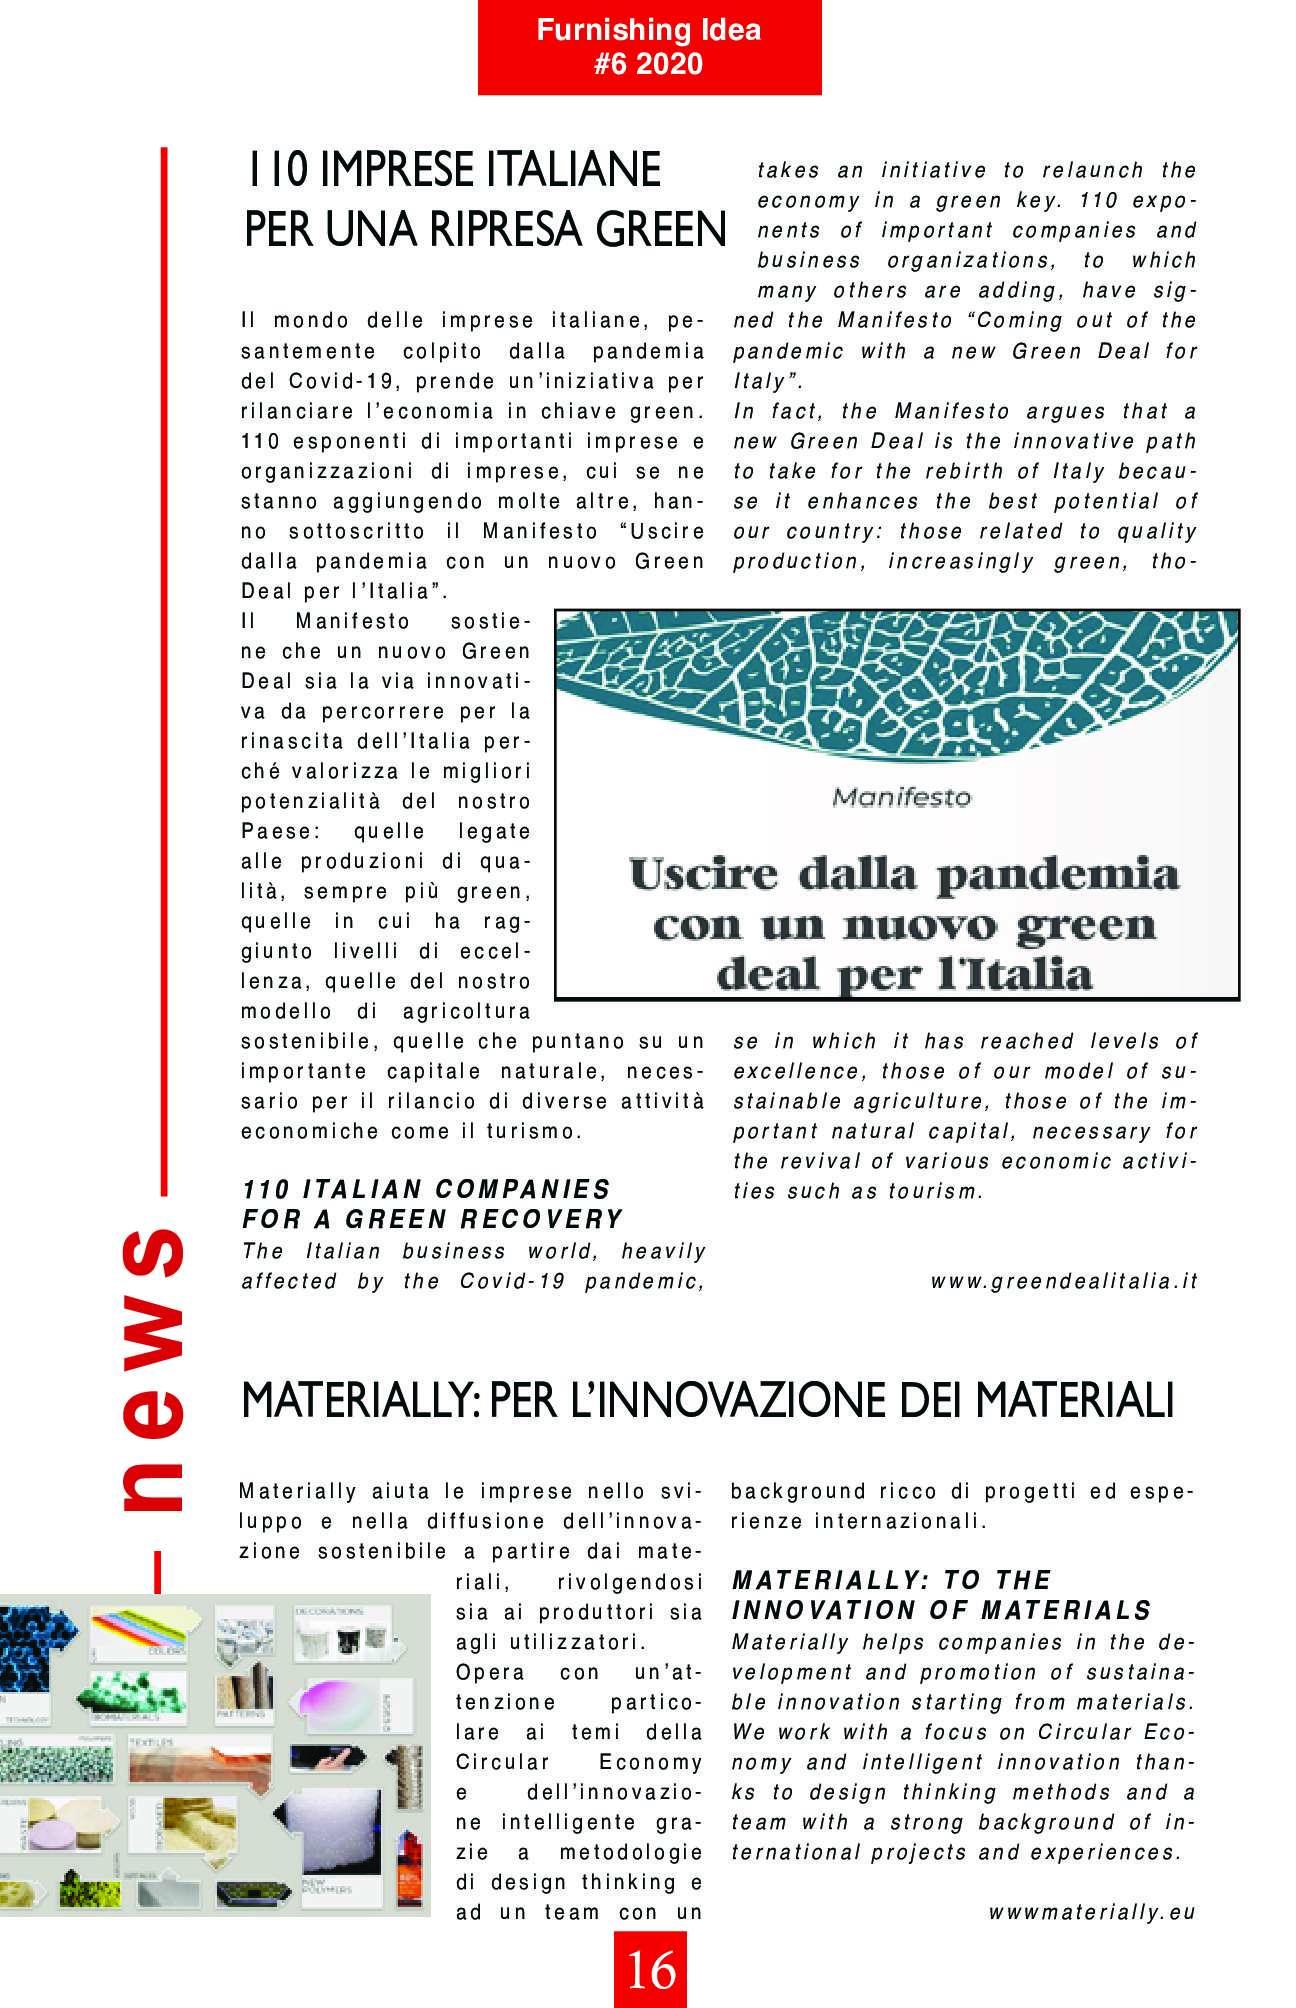 furnishingidea-6-2020_journal_22_015.jpg